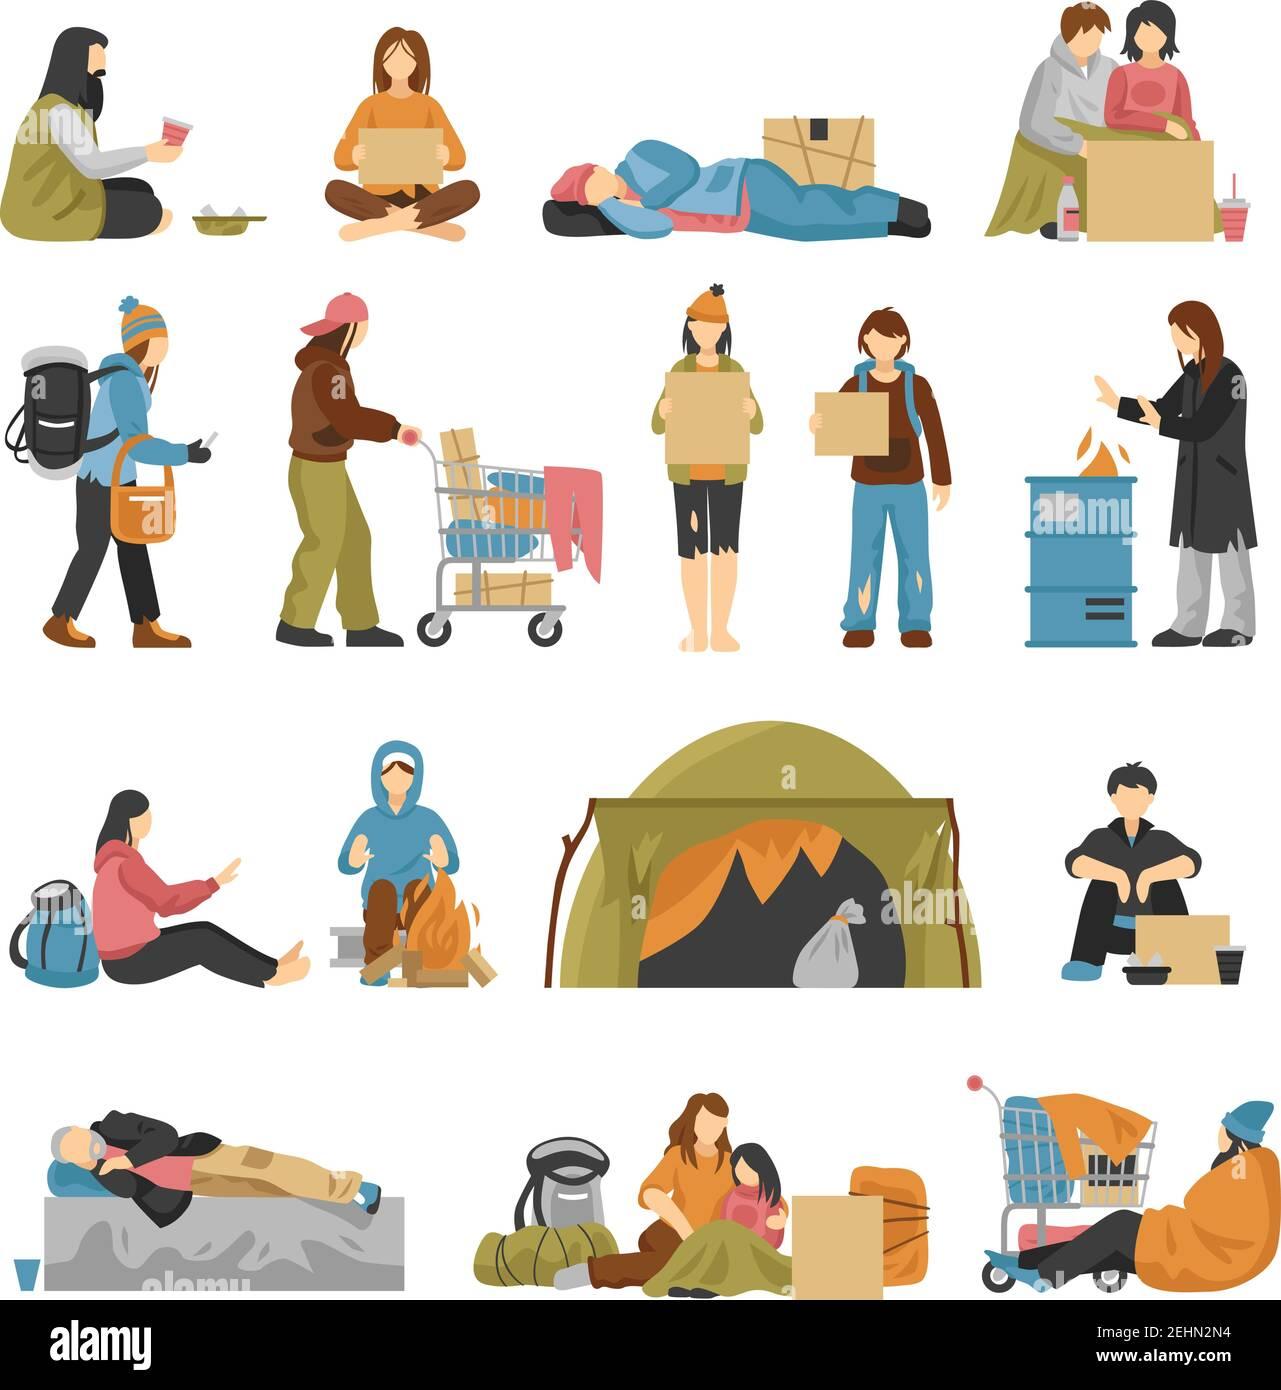 Obdachloser Müll Stock Vektorgrafiken kaufen   Alamy